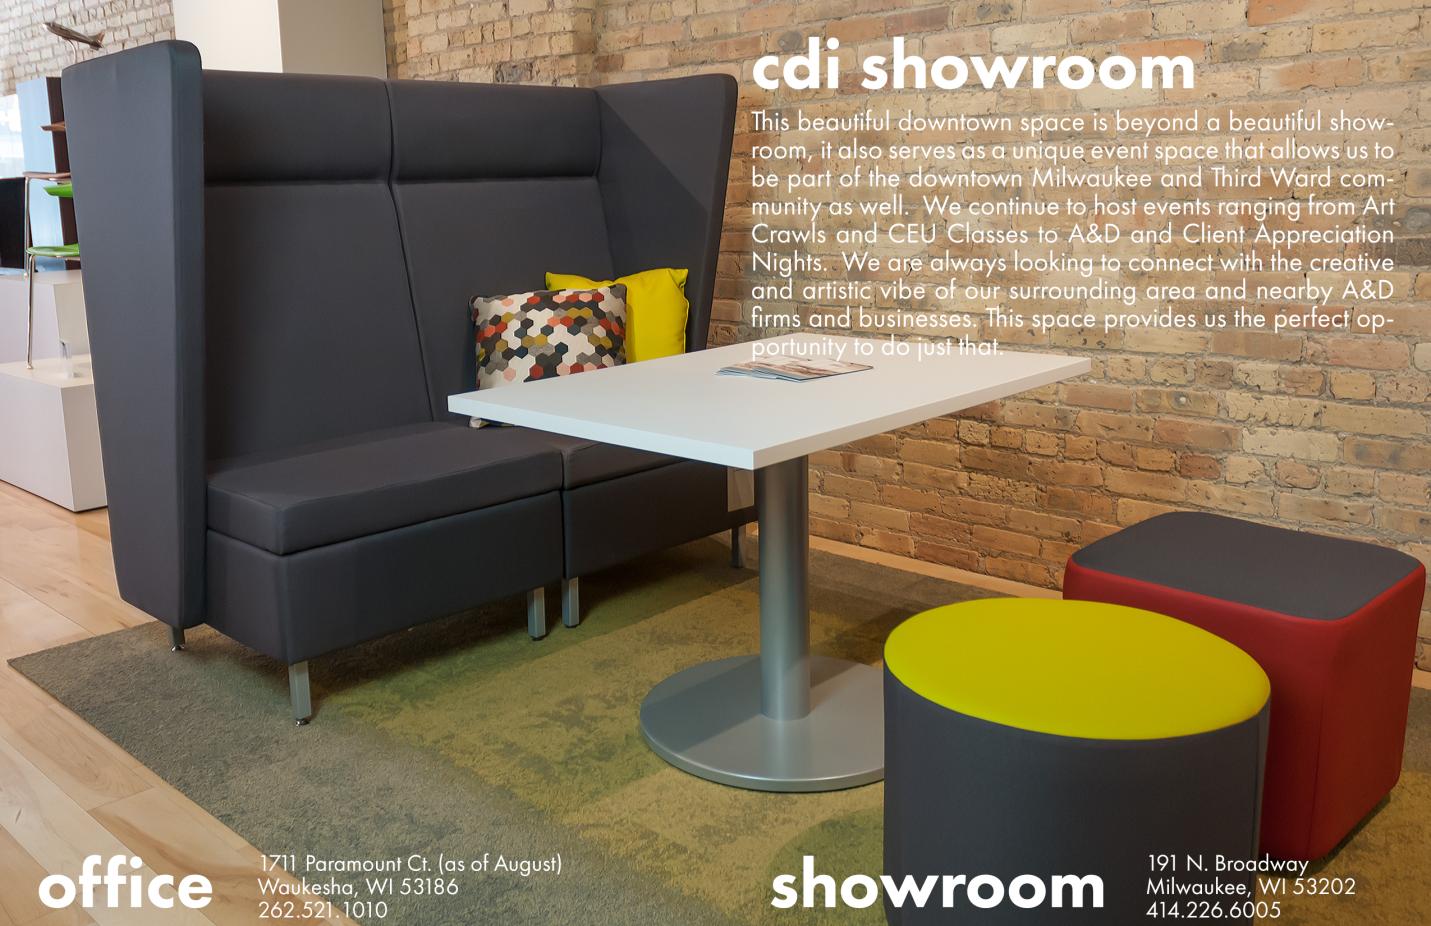 CDI_Showroom